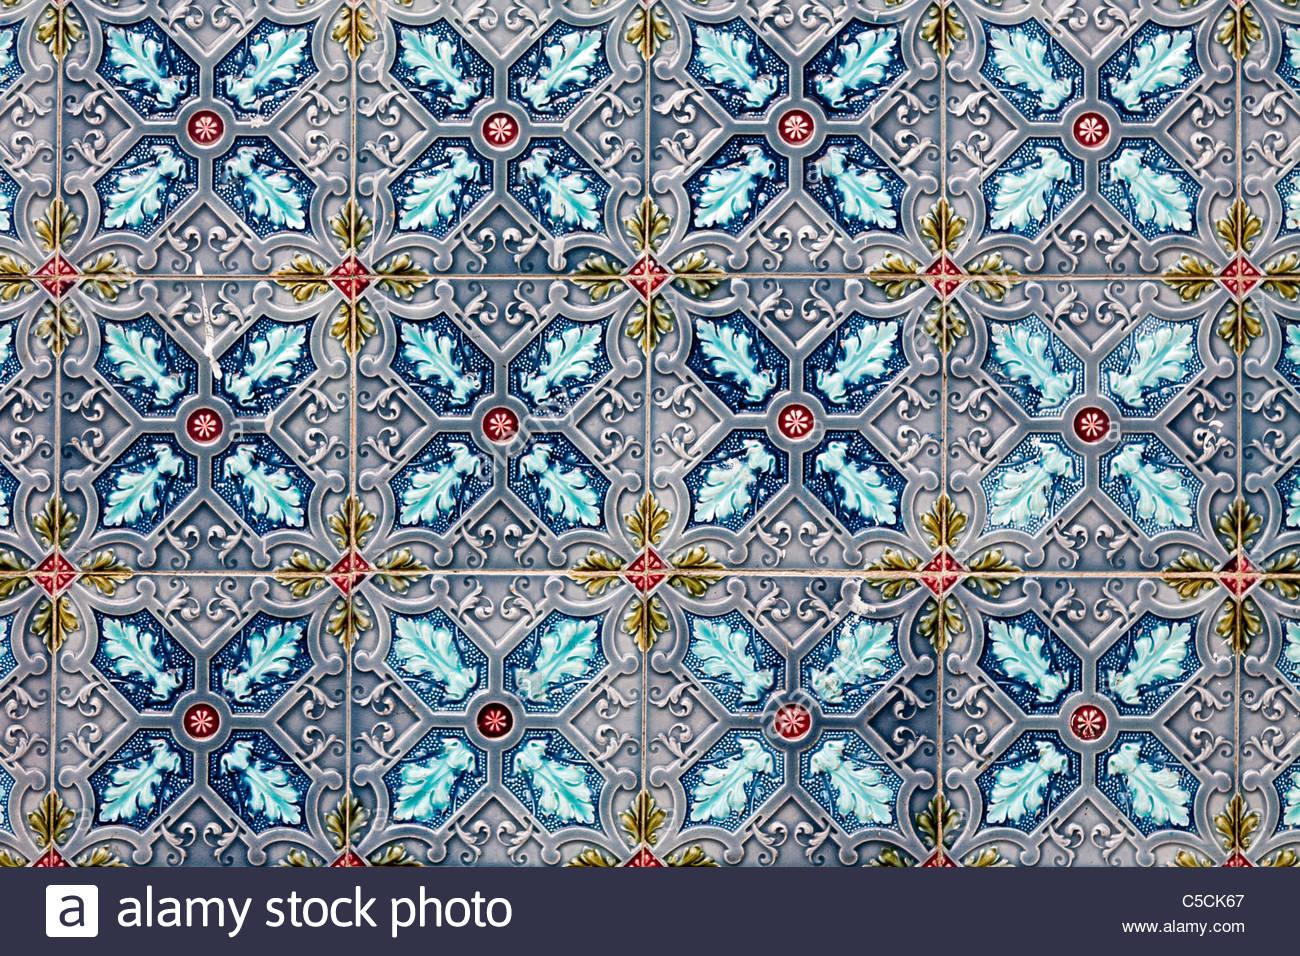 hand painted azulejos stockfotos hand painted azulejos bilder alamy. Black Bedroom Furniture Sets. Home Design Ideas